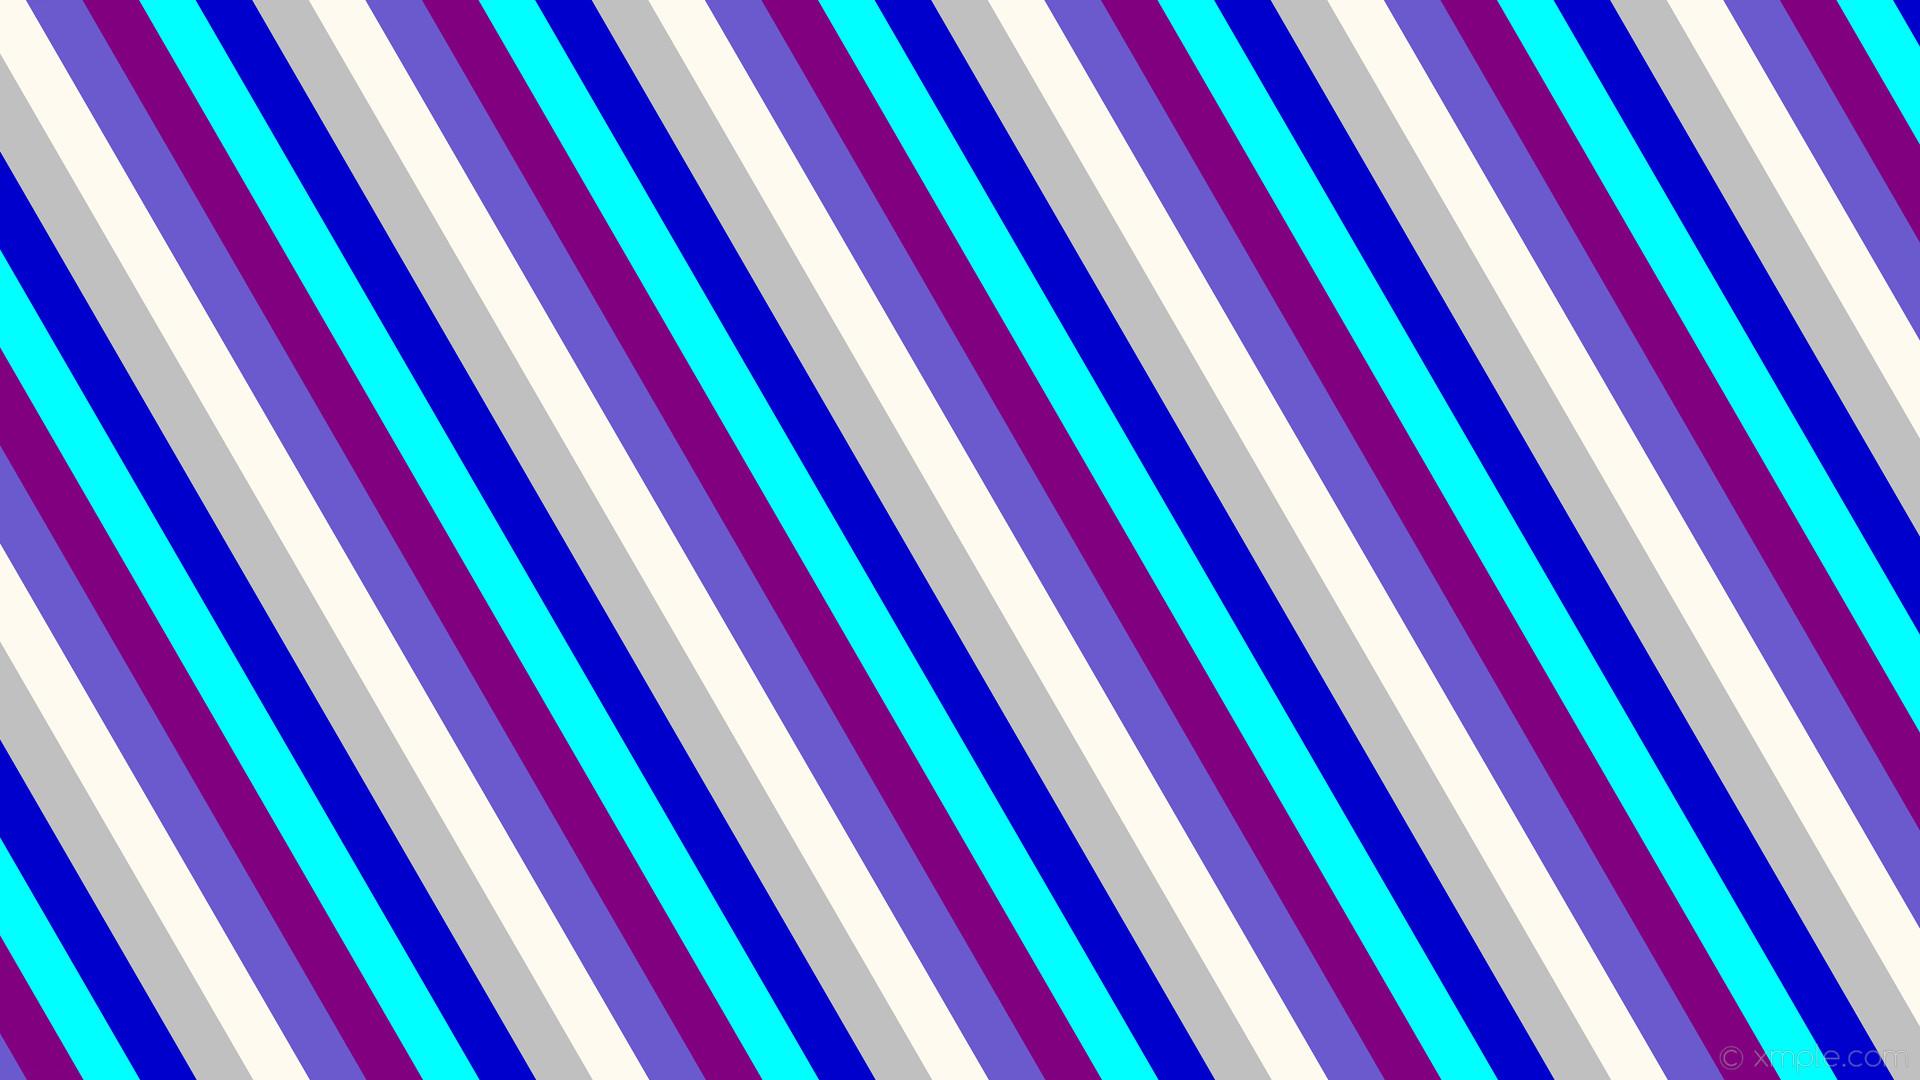 wallpaper grey white lines purple streaks stripes blue silver medium blue  aqua cyan slate blue floral